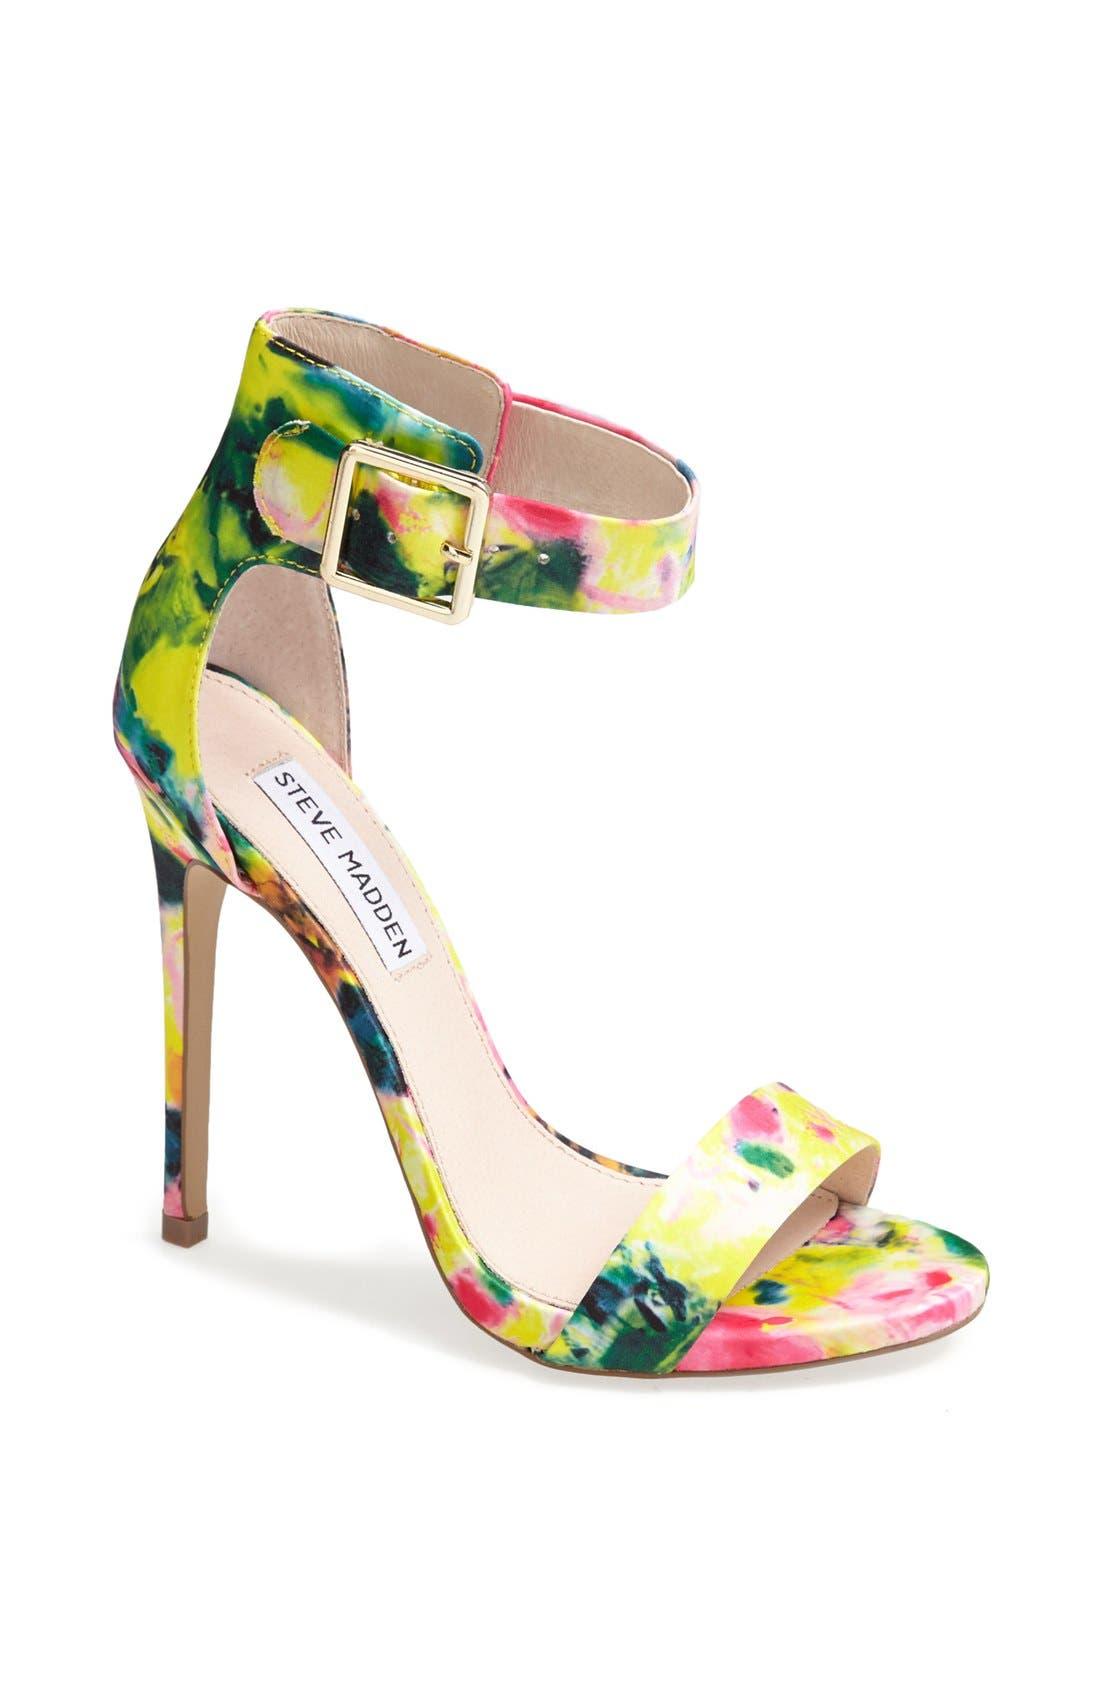 Main Image - Steve Madden 'Marlenee' Floral Print Sandal